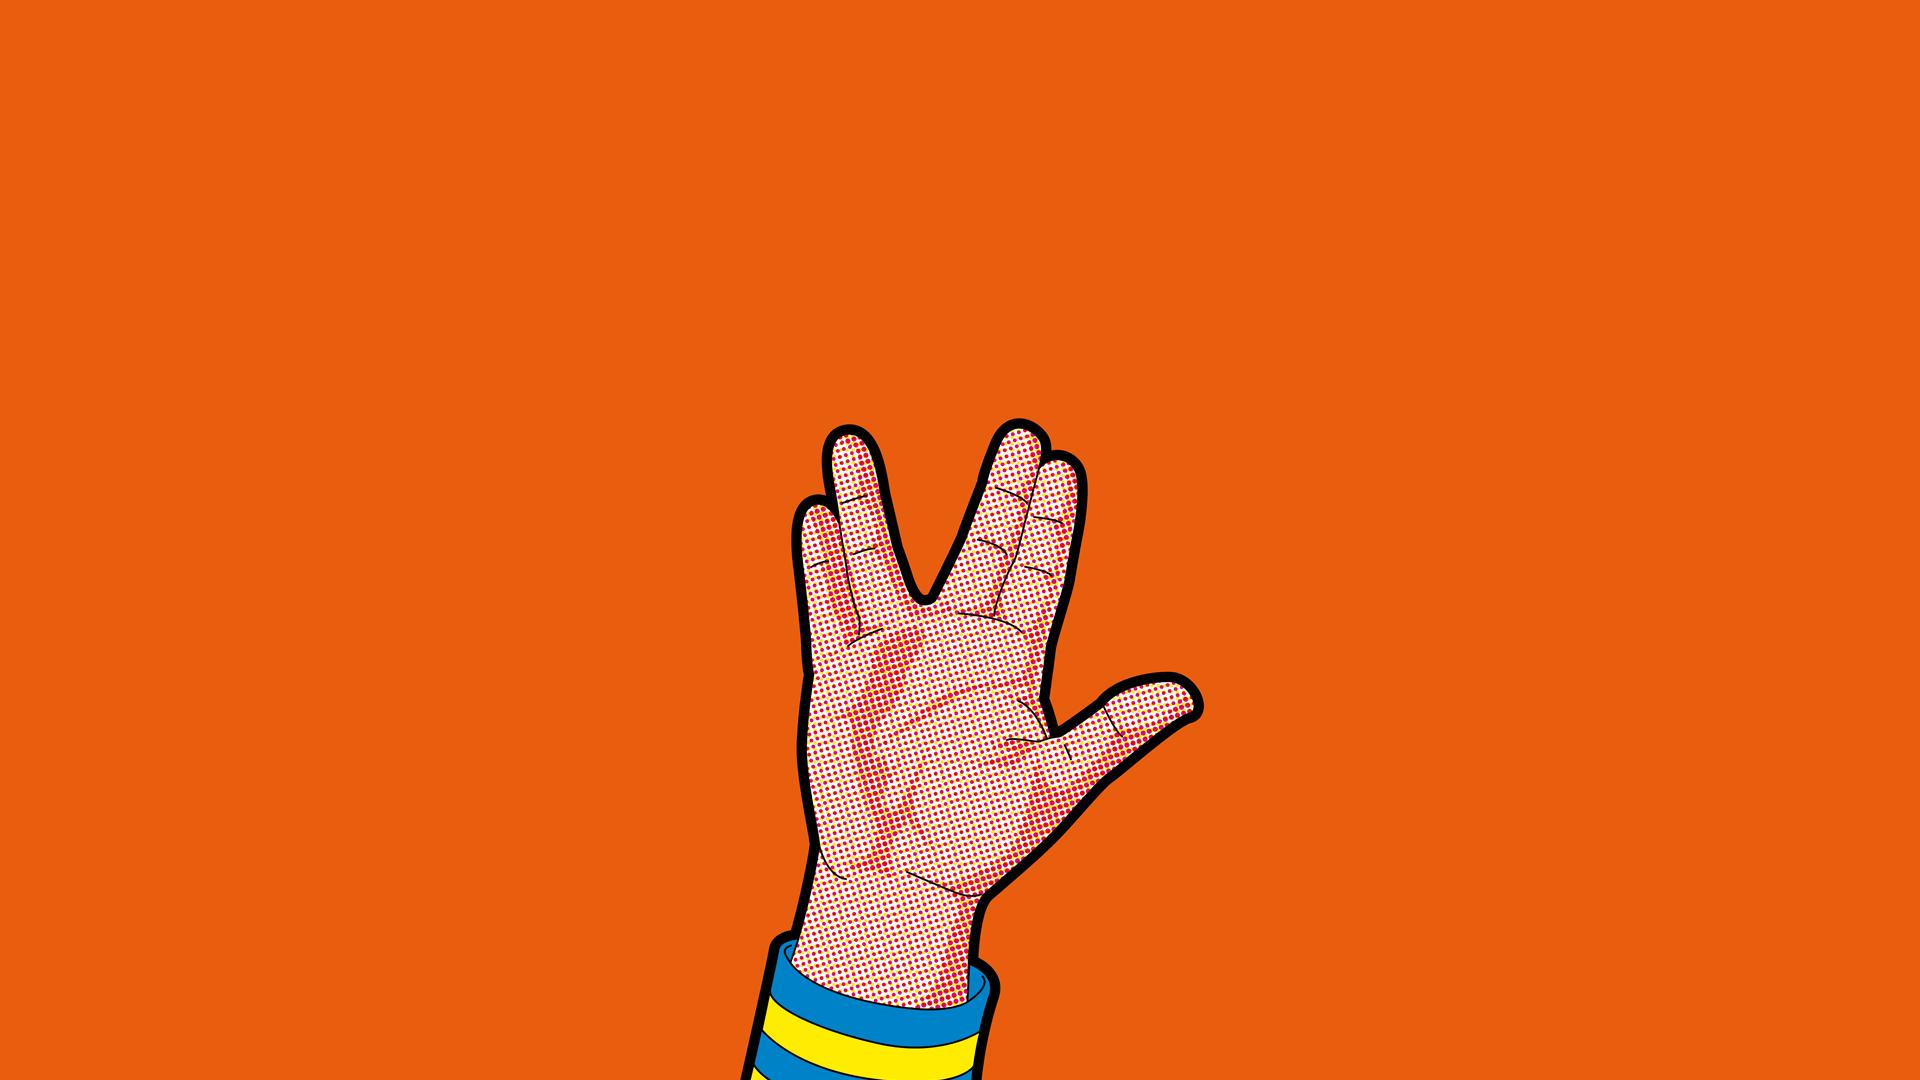 Illustration Cartoon Science Fiction Star Trek Live Long And Prosper Spock Hand Finger Arm Font Organ